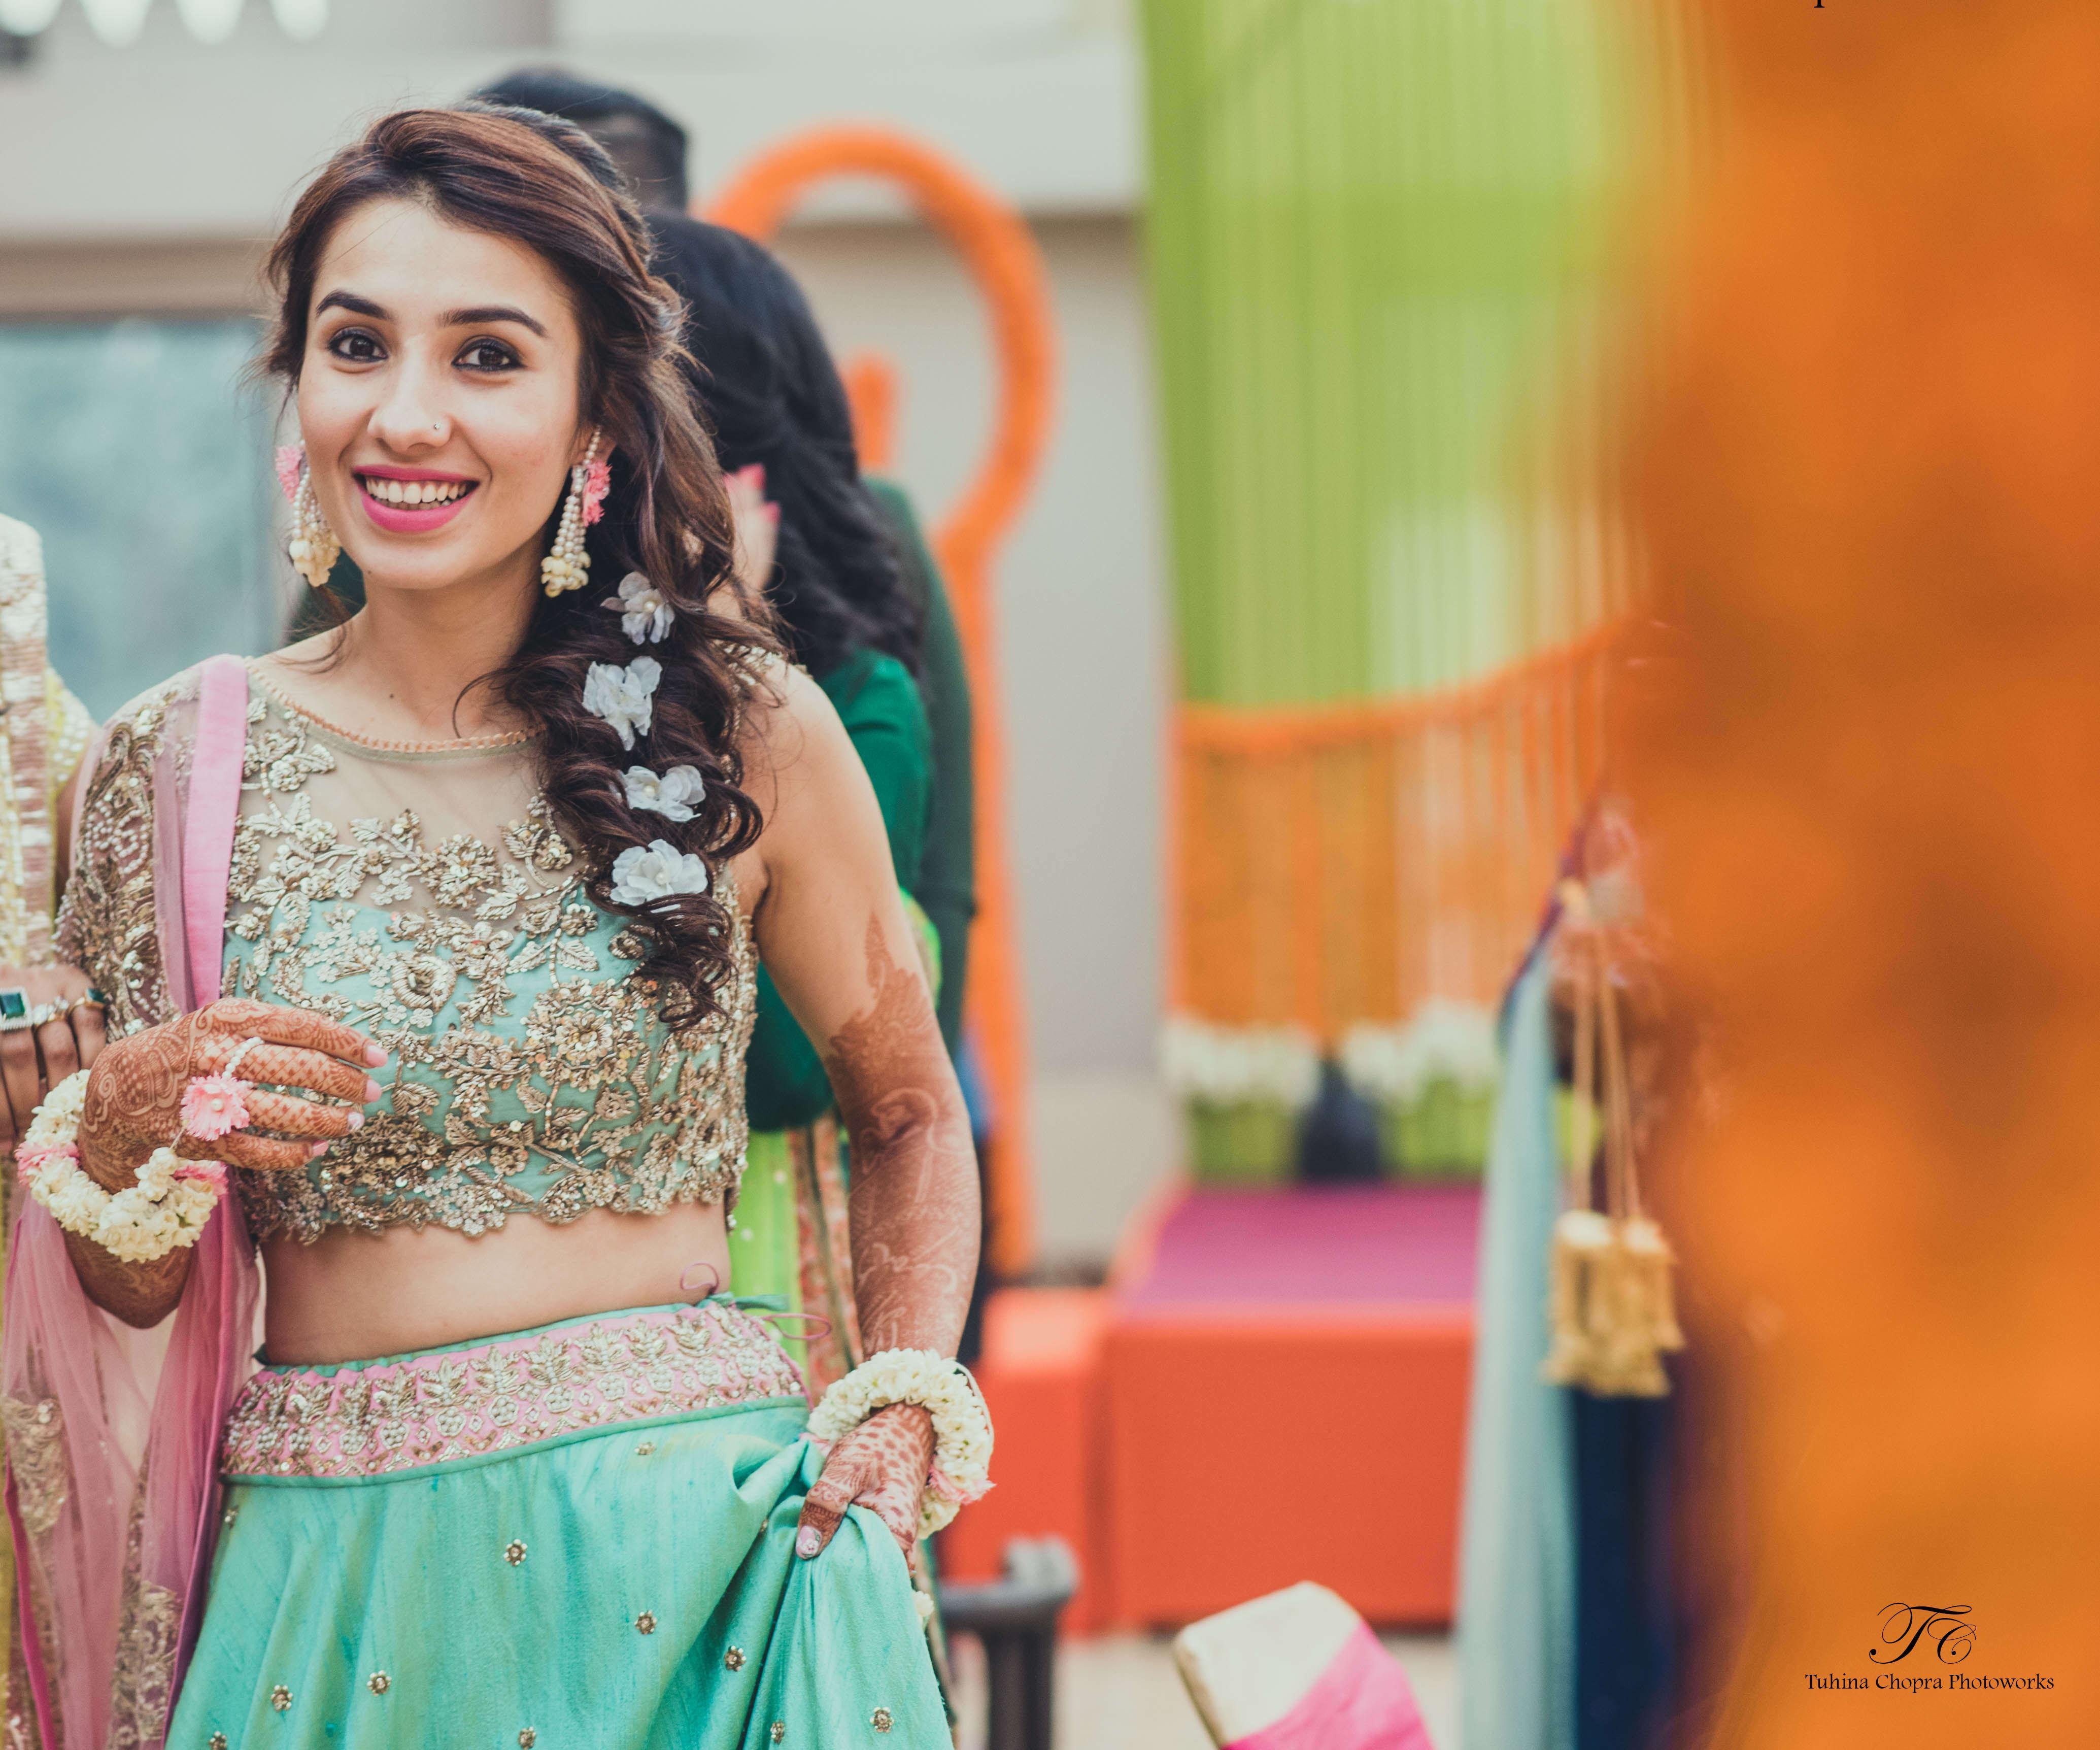 ready for sangeet:tuhina chopra photoworks